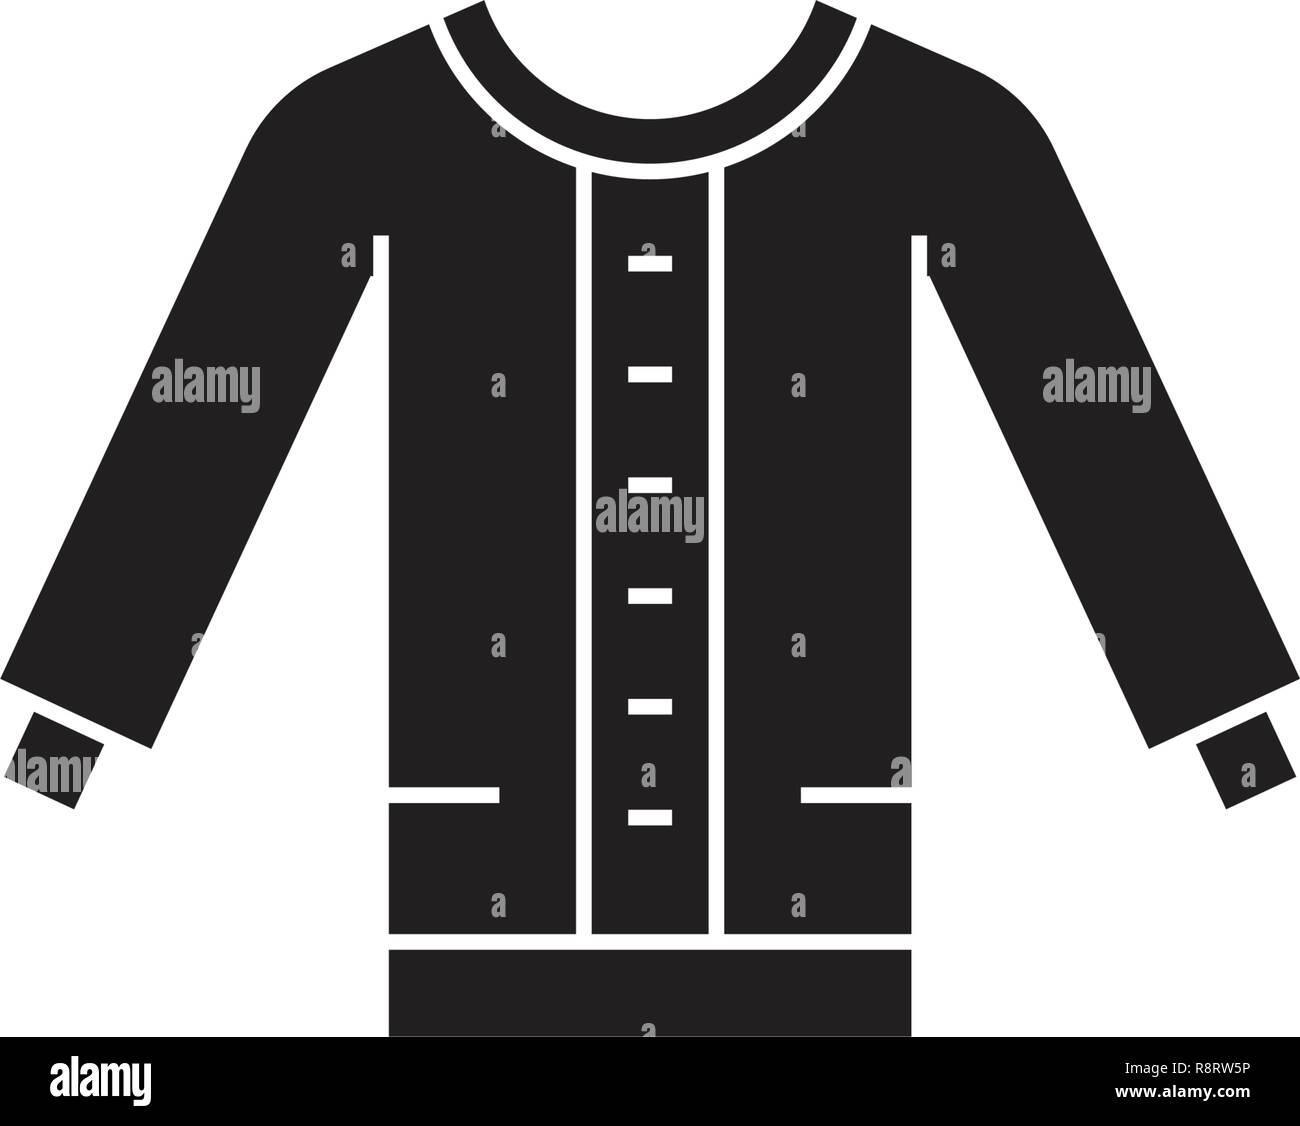 de9b282aa82 Women sweater black vector concept icon. Women sweater flat illustration,  sign